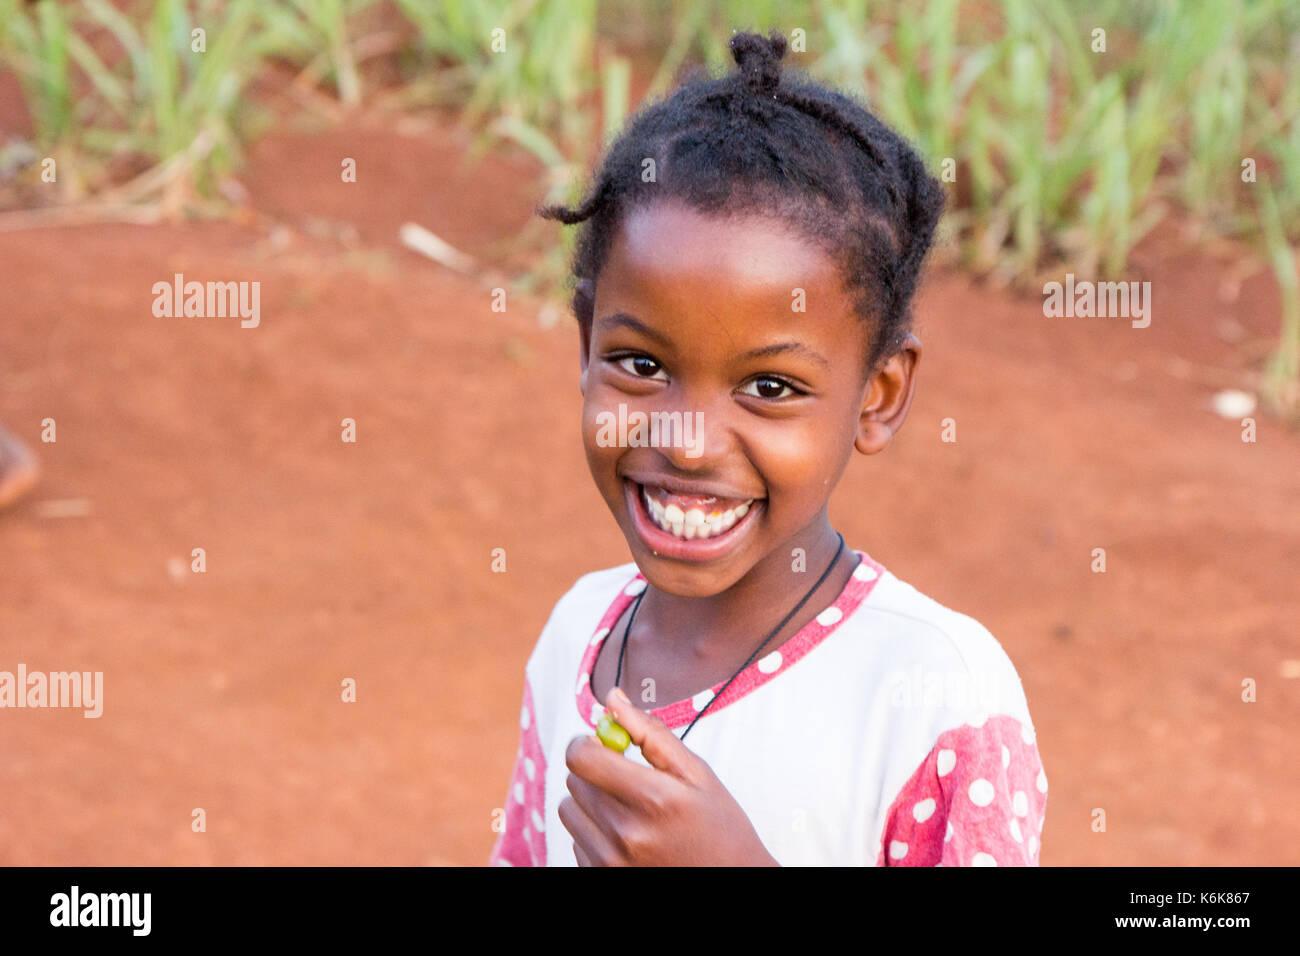 Africa African Black Preteen Stock Photos Amp Africa African